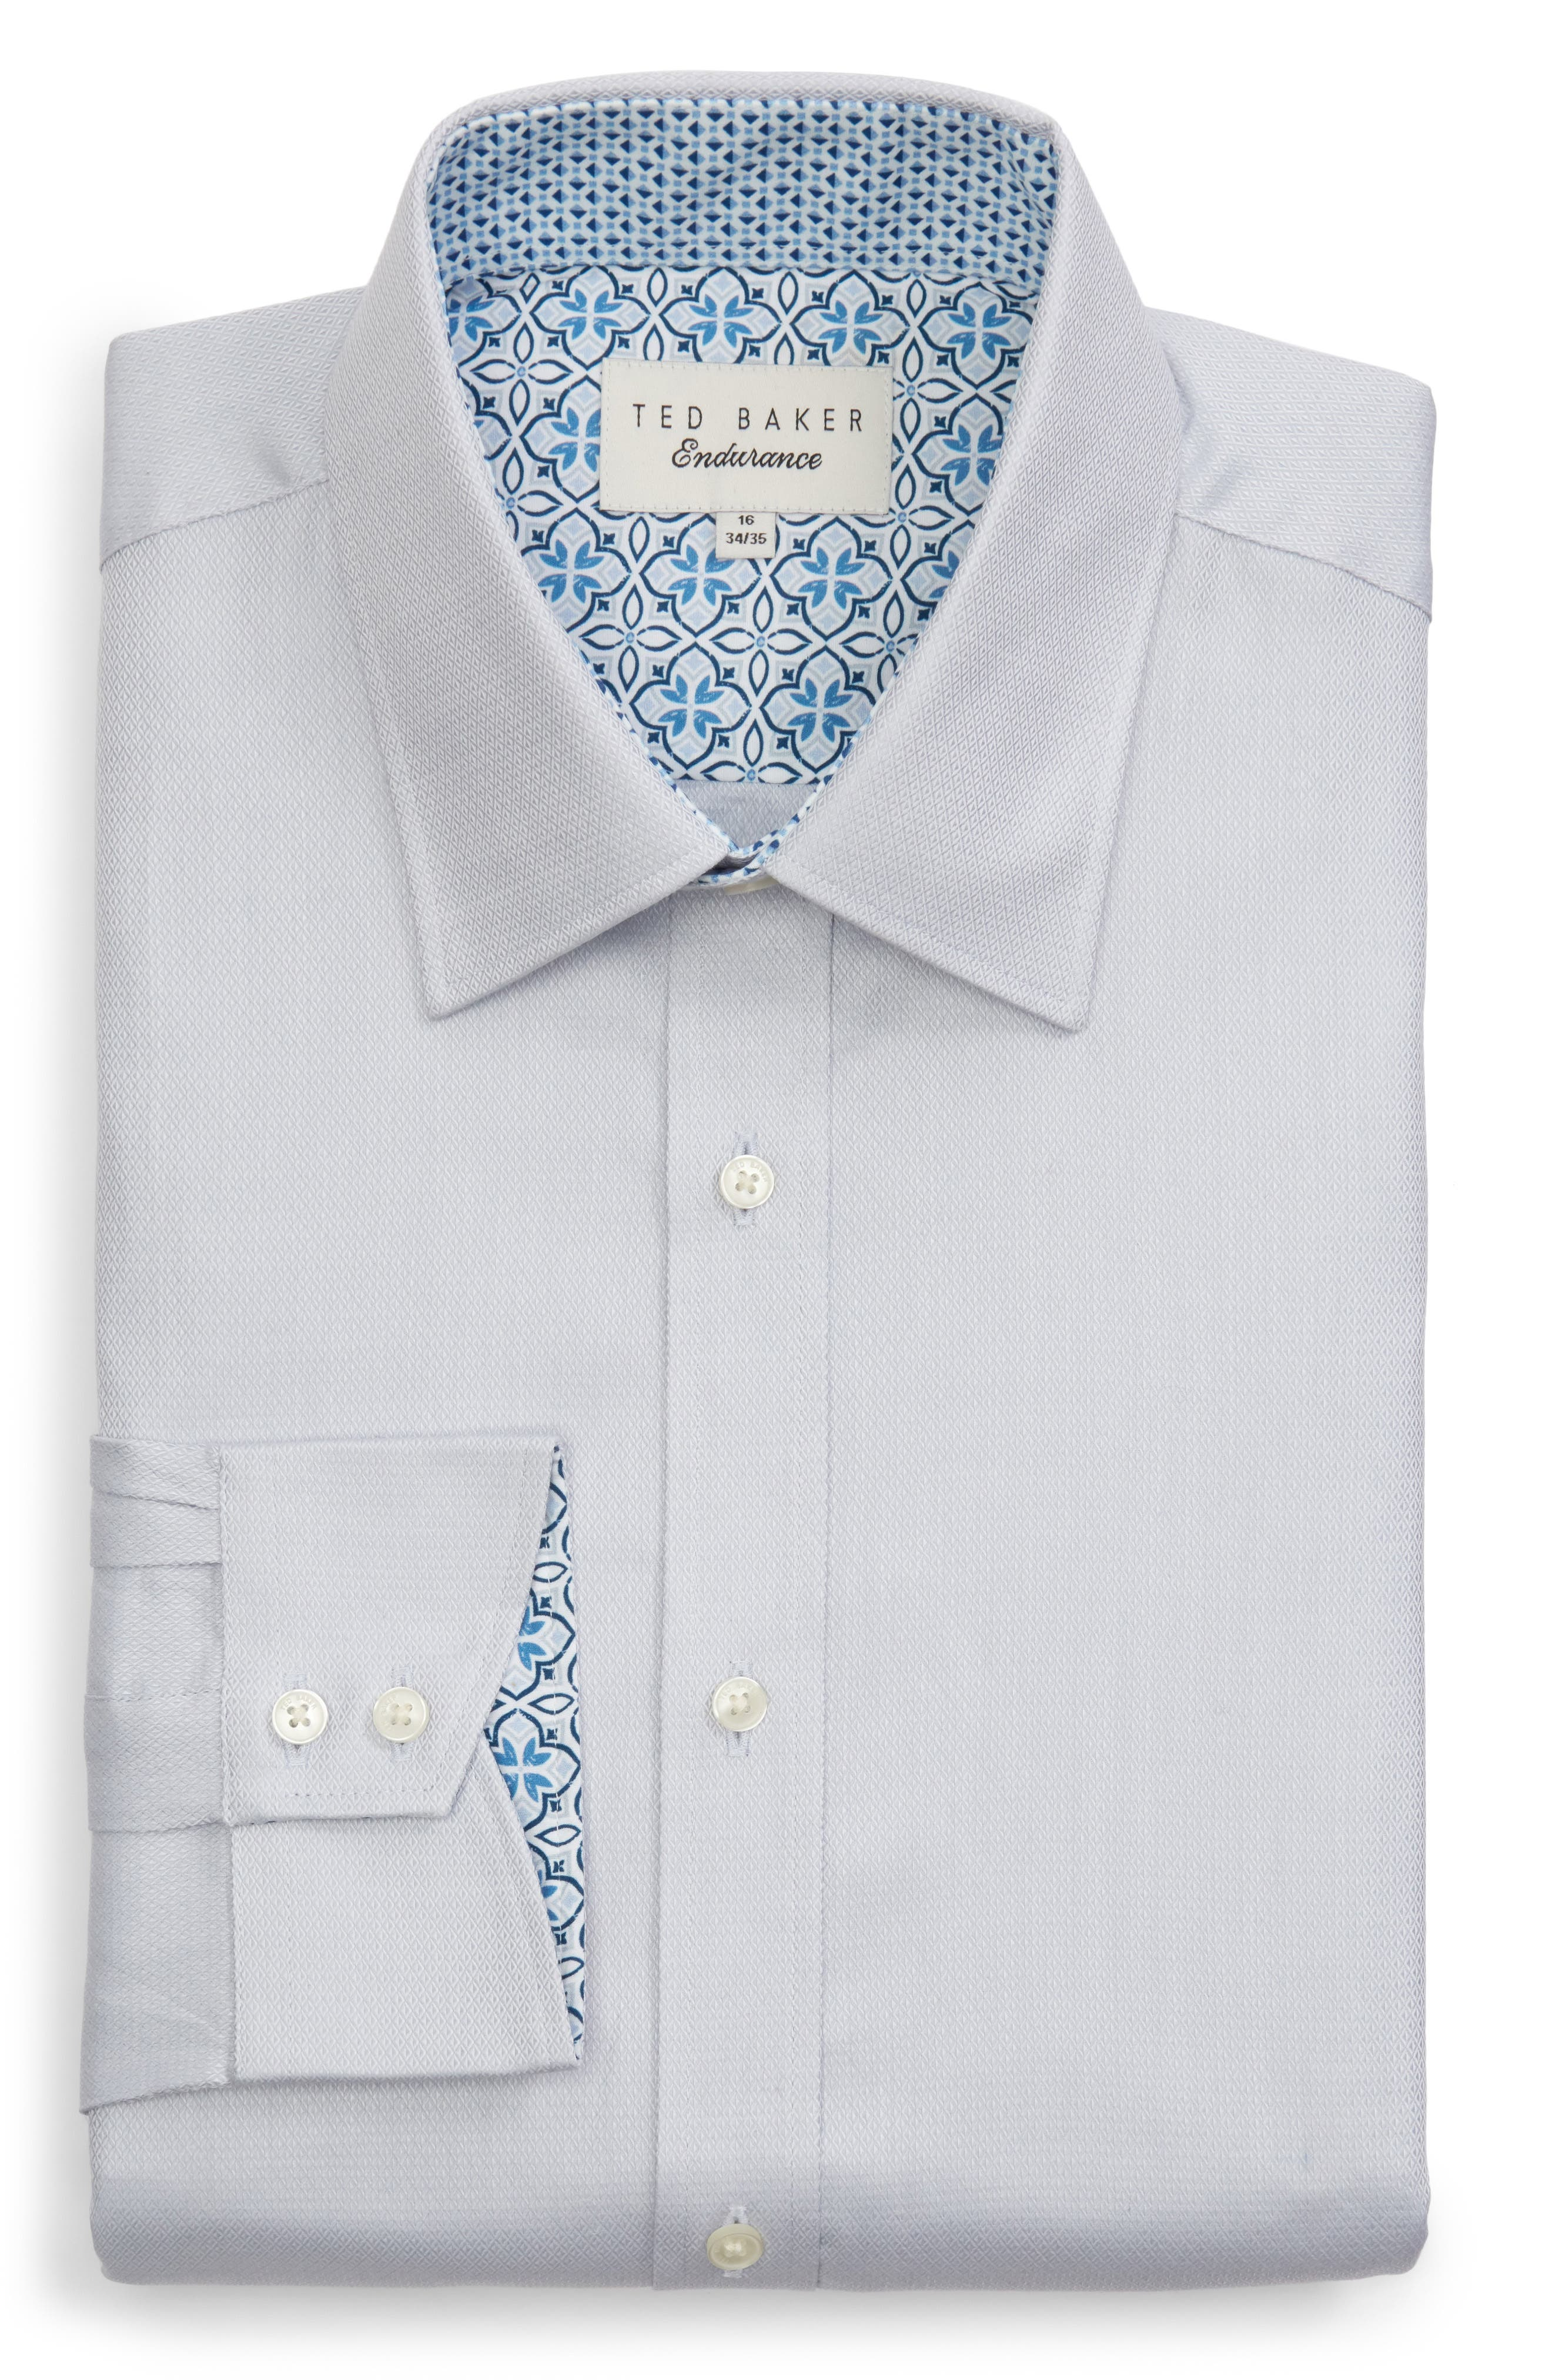 Ollyox Slim Fit Solid Dress Shirt,                             Alternate thumbnail 5, color,                             GREY